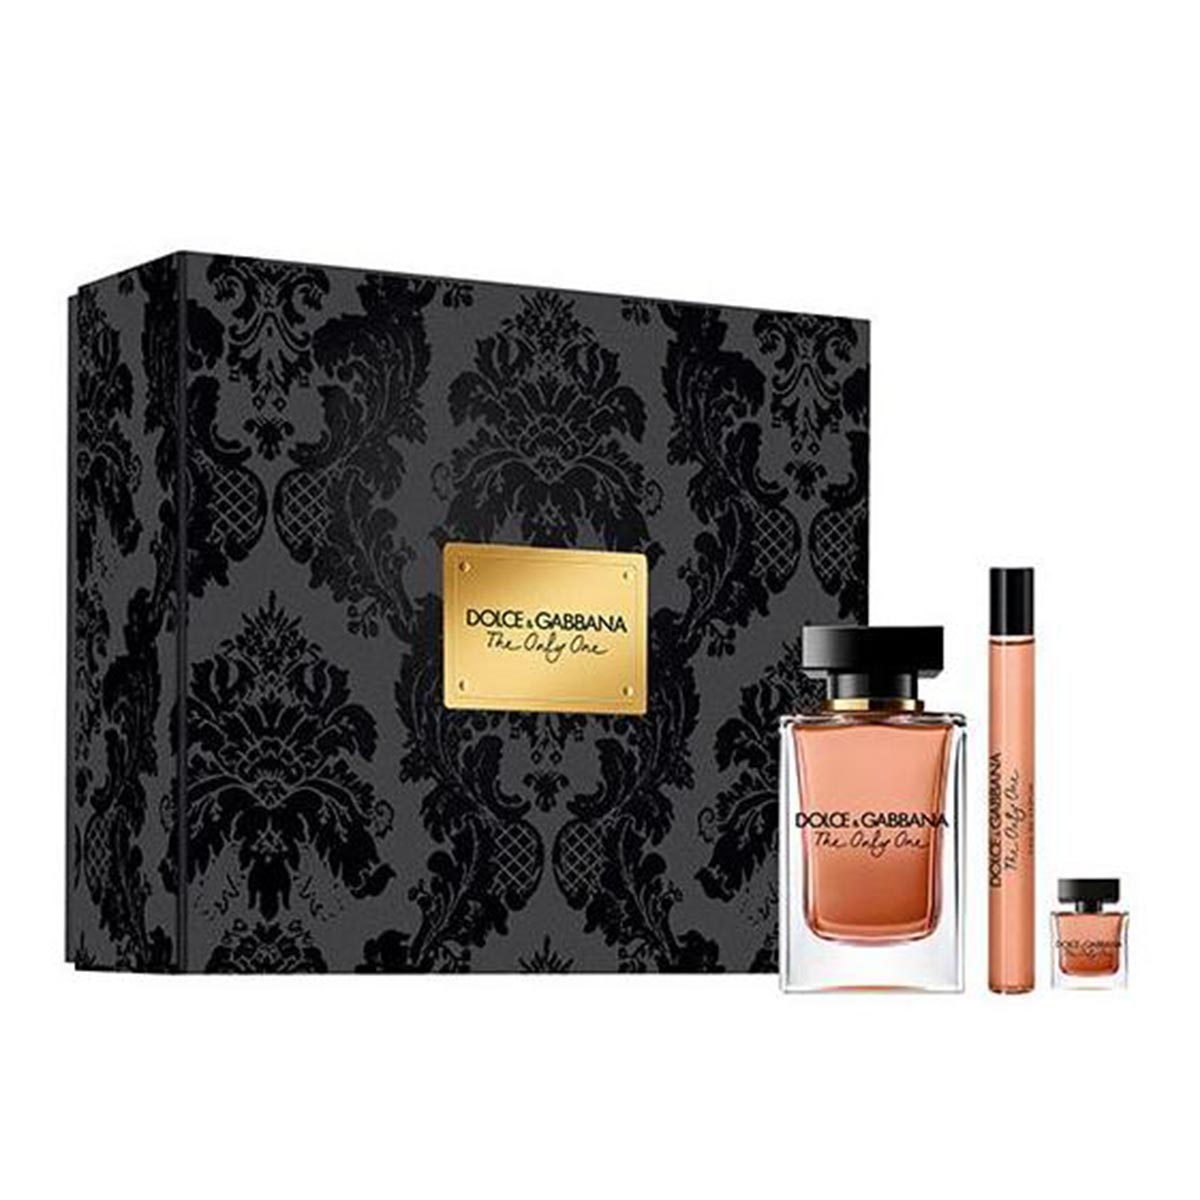 Dolce gabbana the one only eau de parfum 100ml vaporizador eau de parfum 10ml vaporizador miniatura 7 5ml